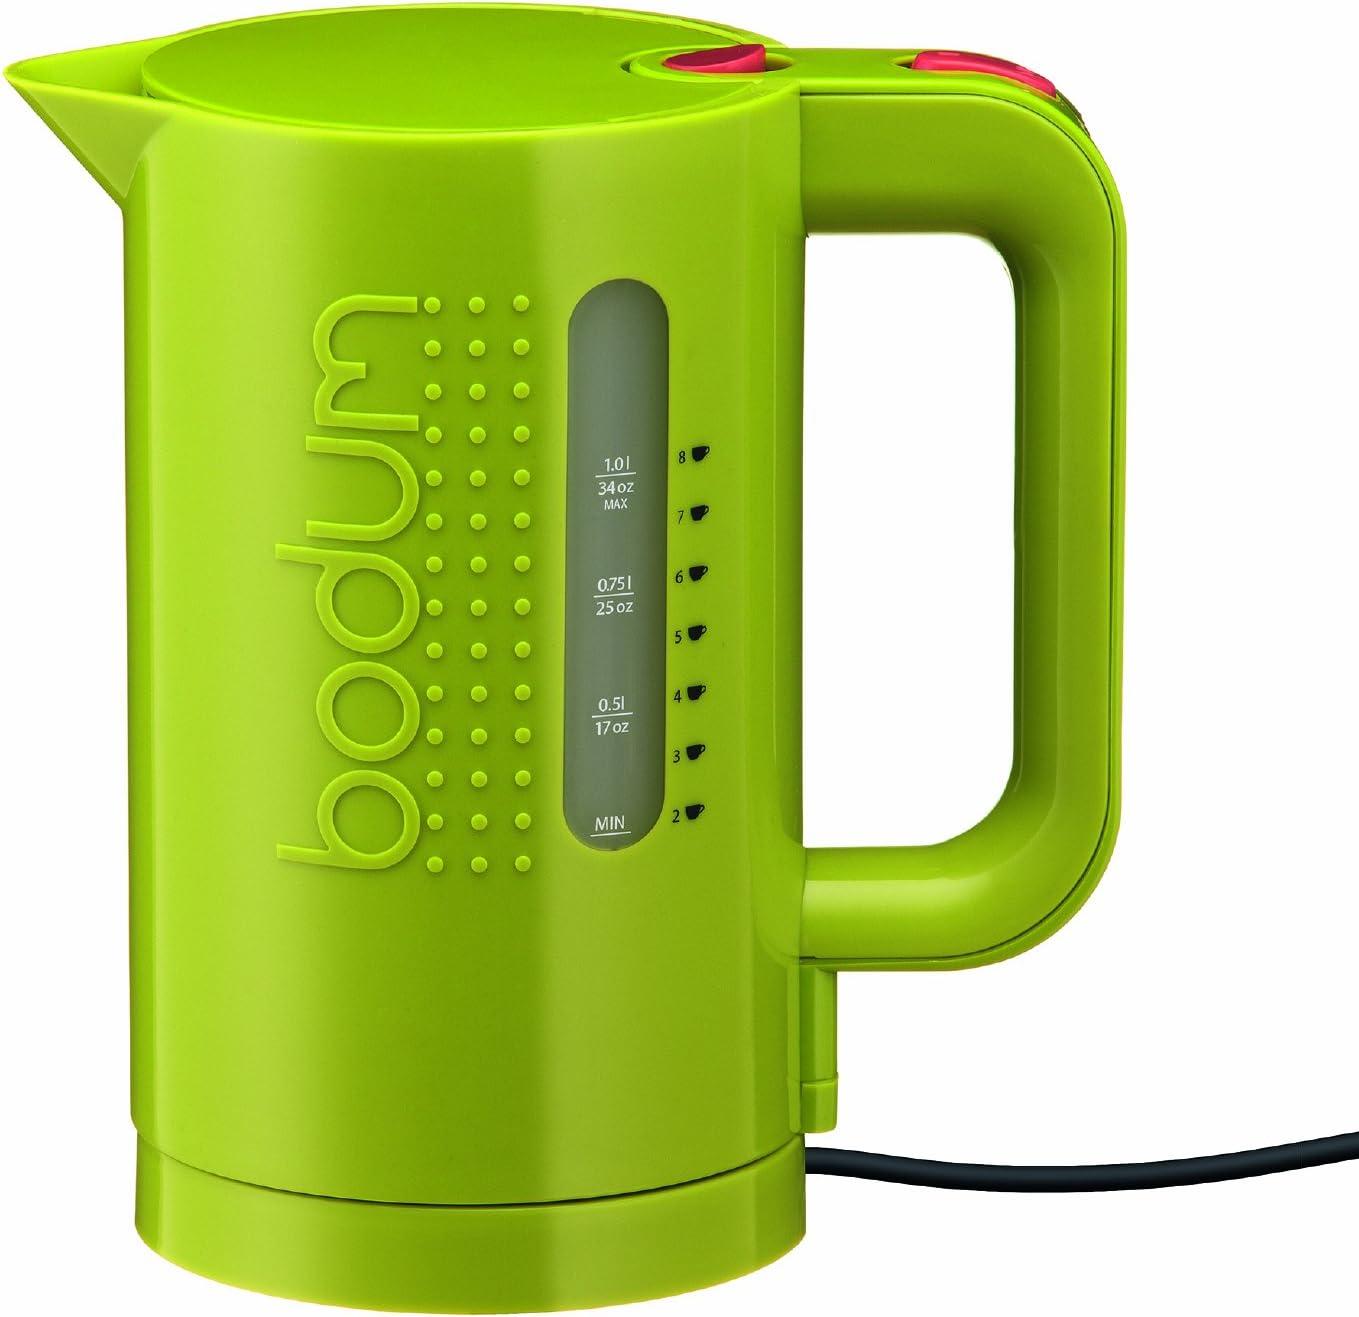 Bodum Bistro Electric Water Kettle, 1.0